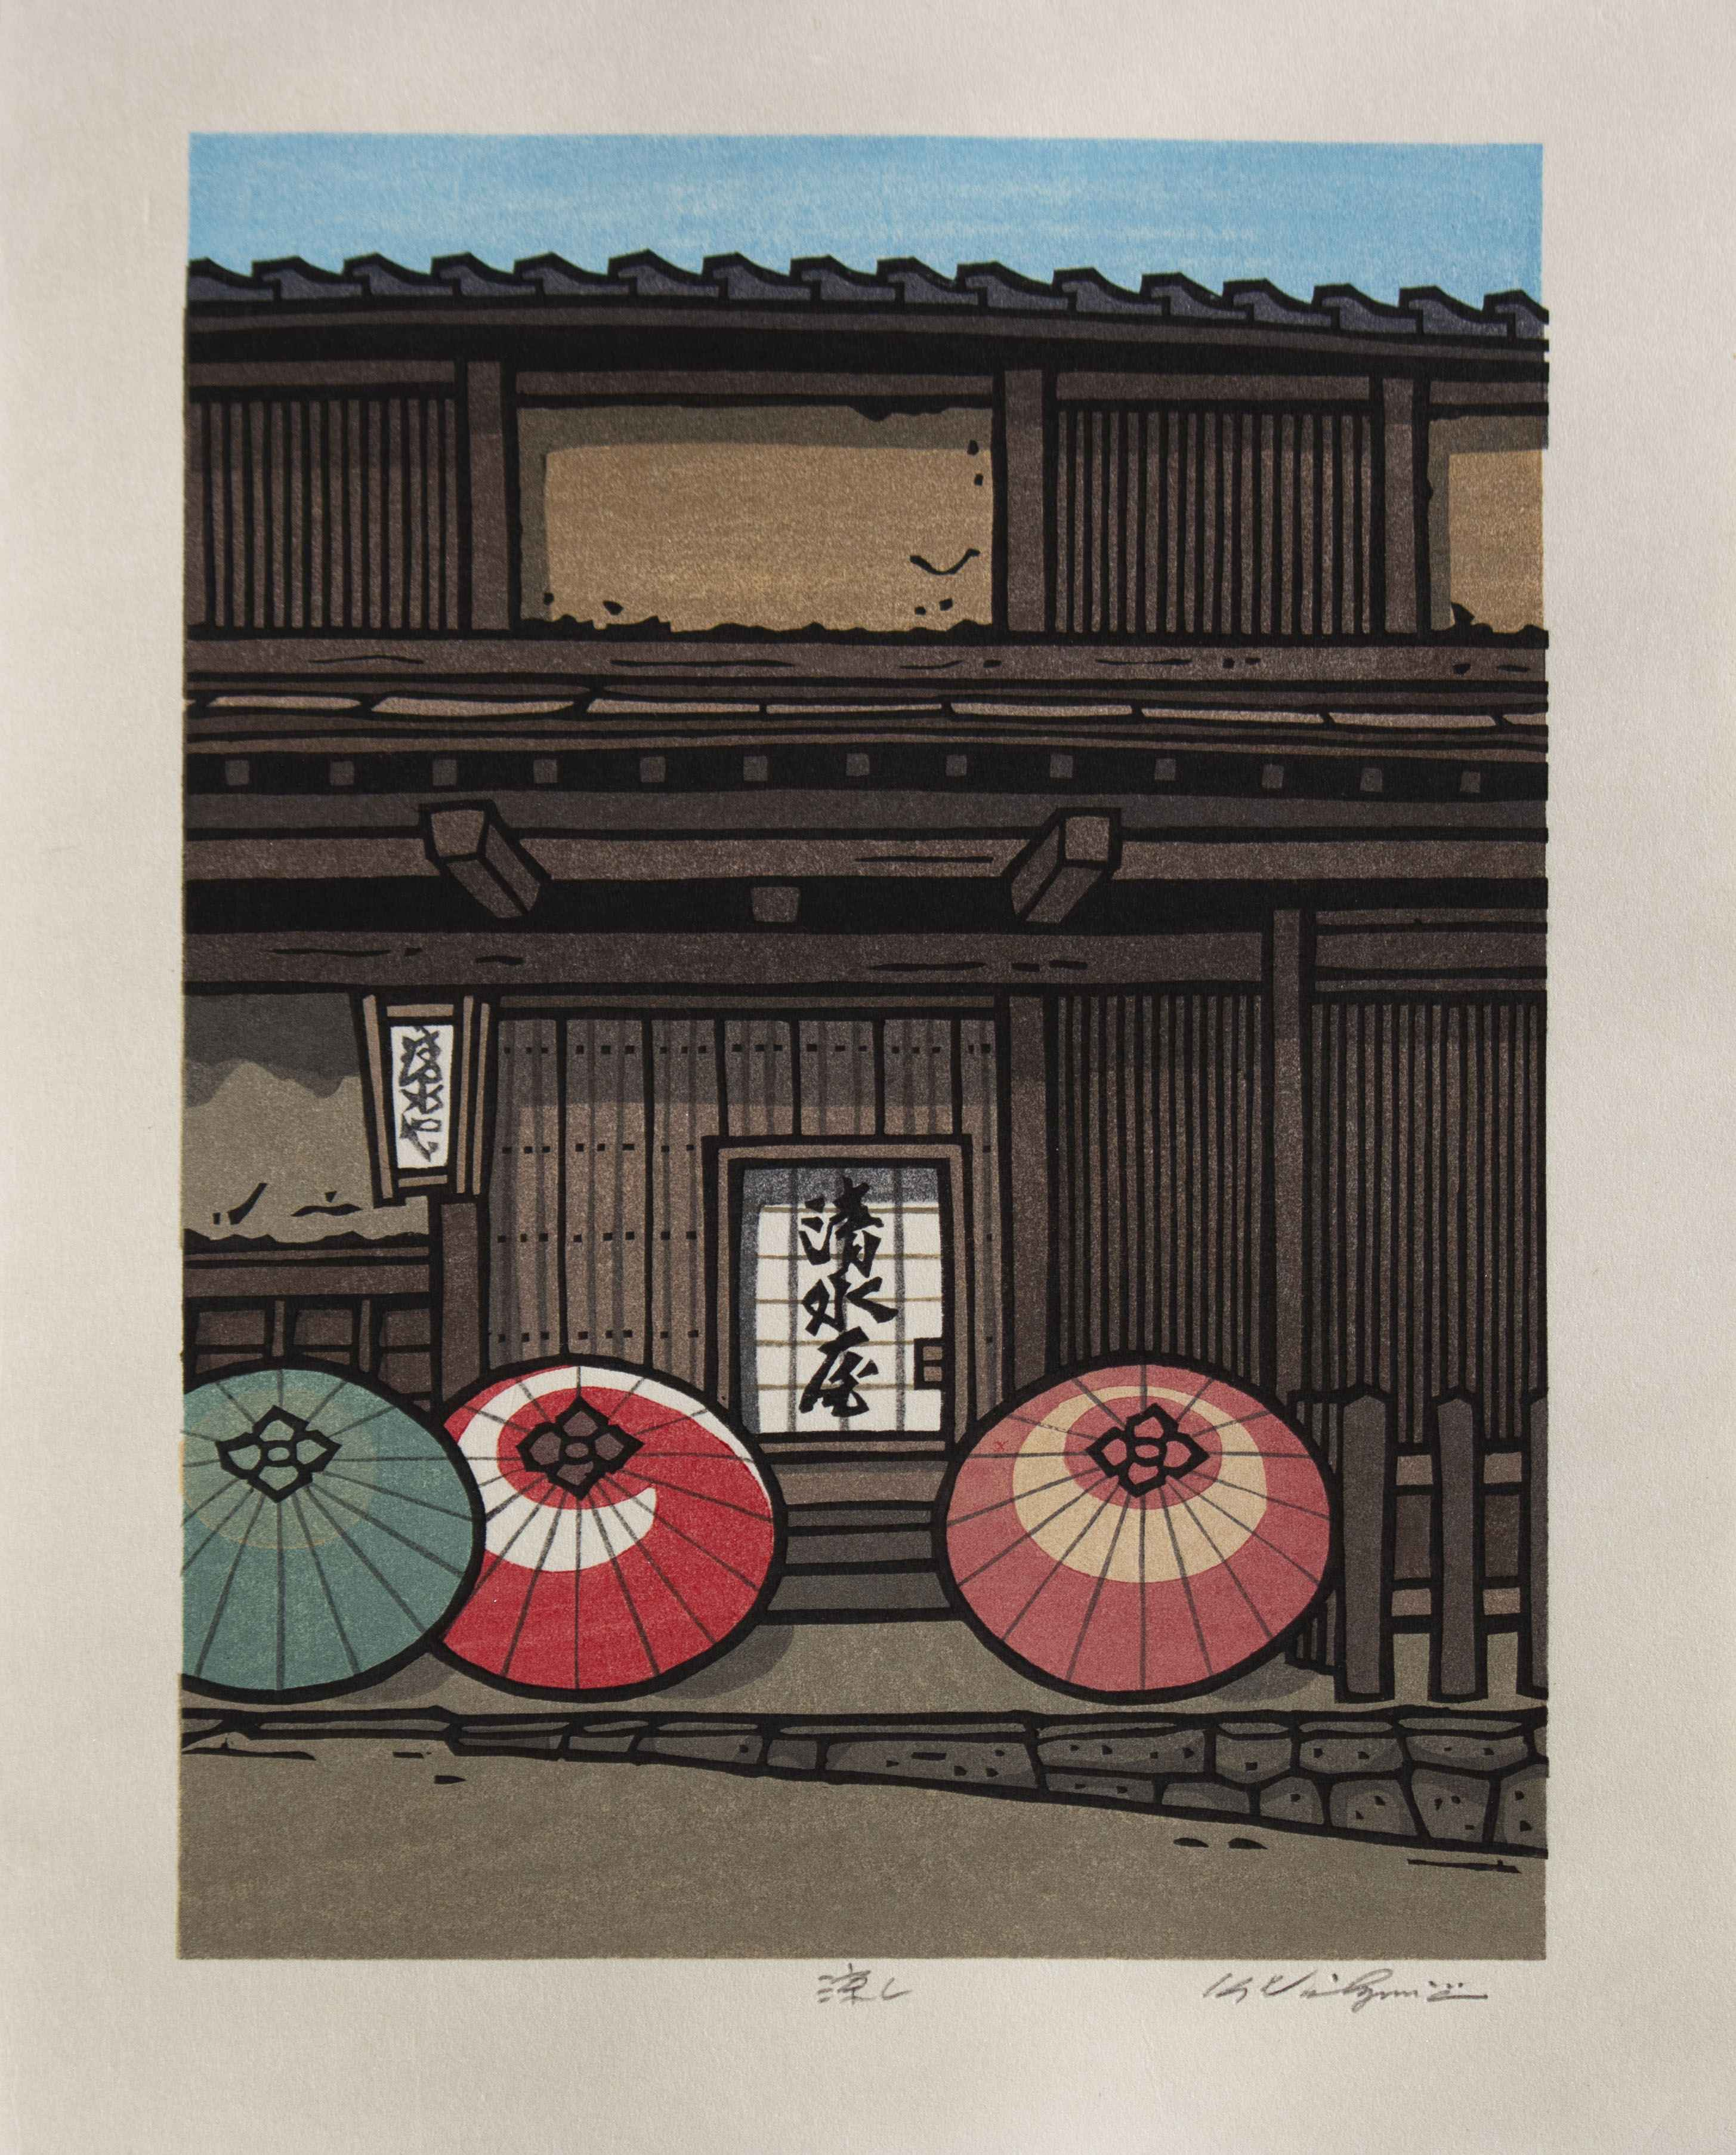 Suzushi by  Katsuyuki Nishijima - Masterpiece Online